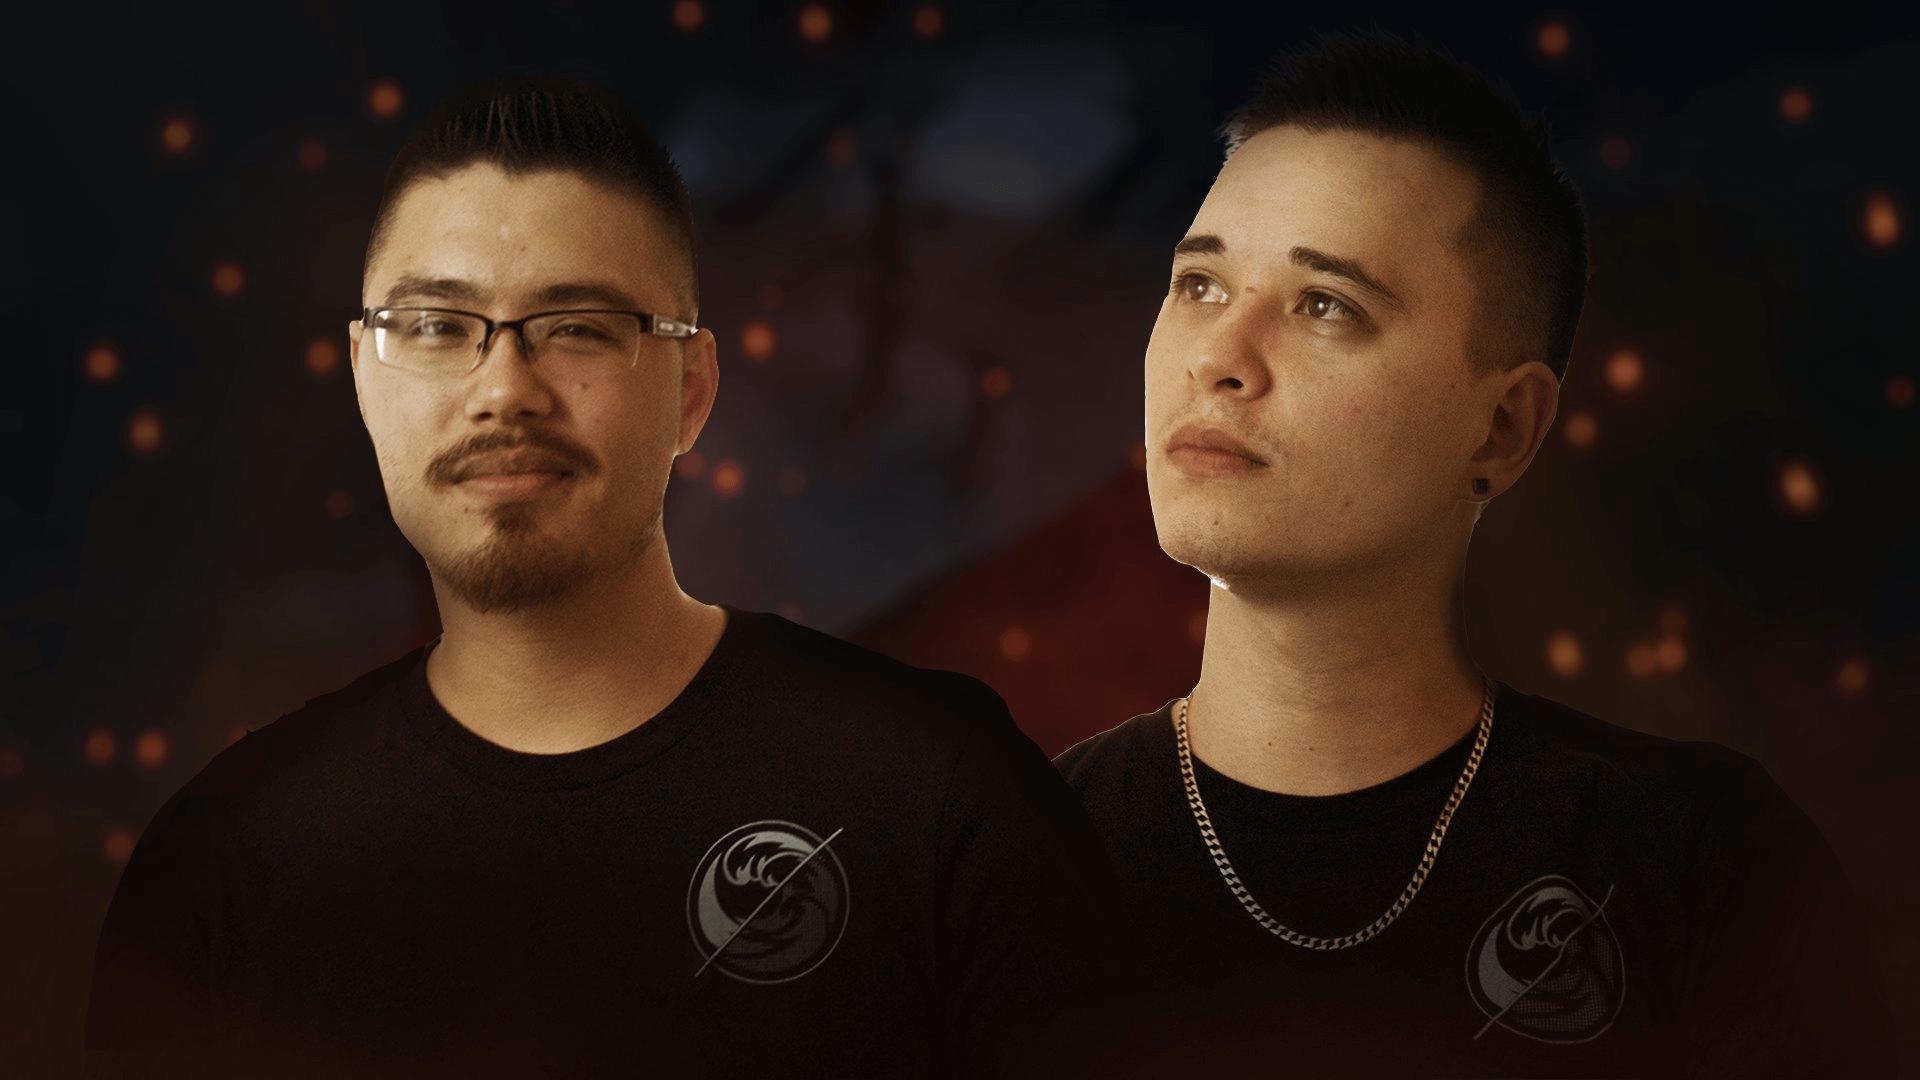 Mortal Kombat 11 pro players: brothers Biohazard and HoneyBee